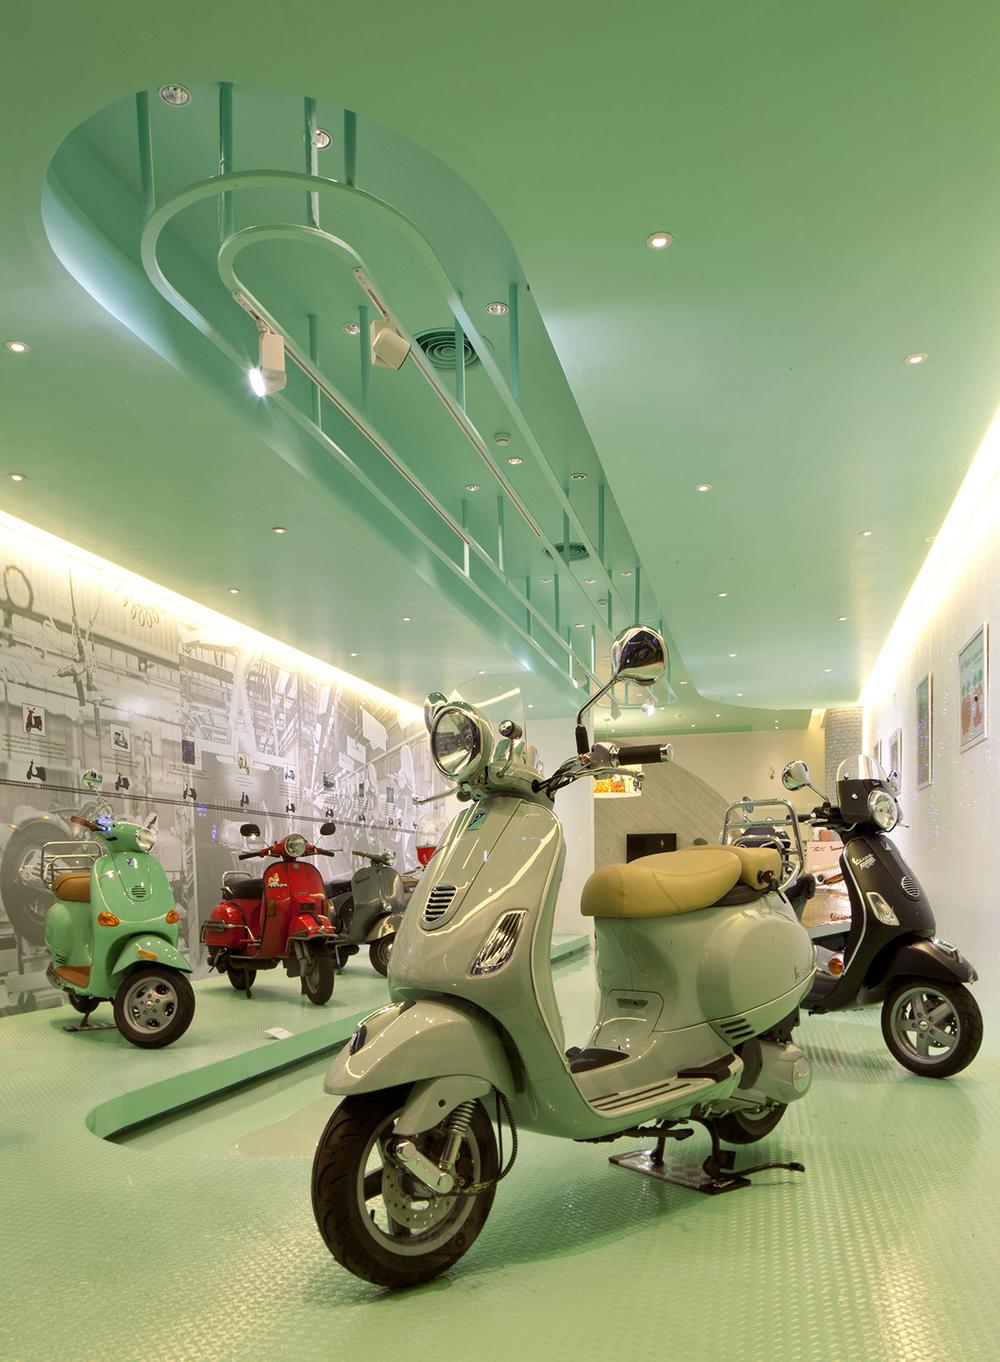 Vespa-Gallery-Store-Bangkok-Supermachine-LG4.jpg